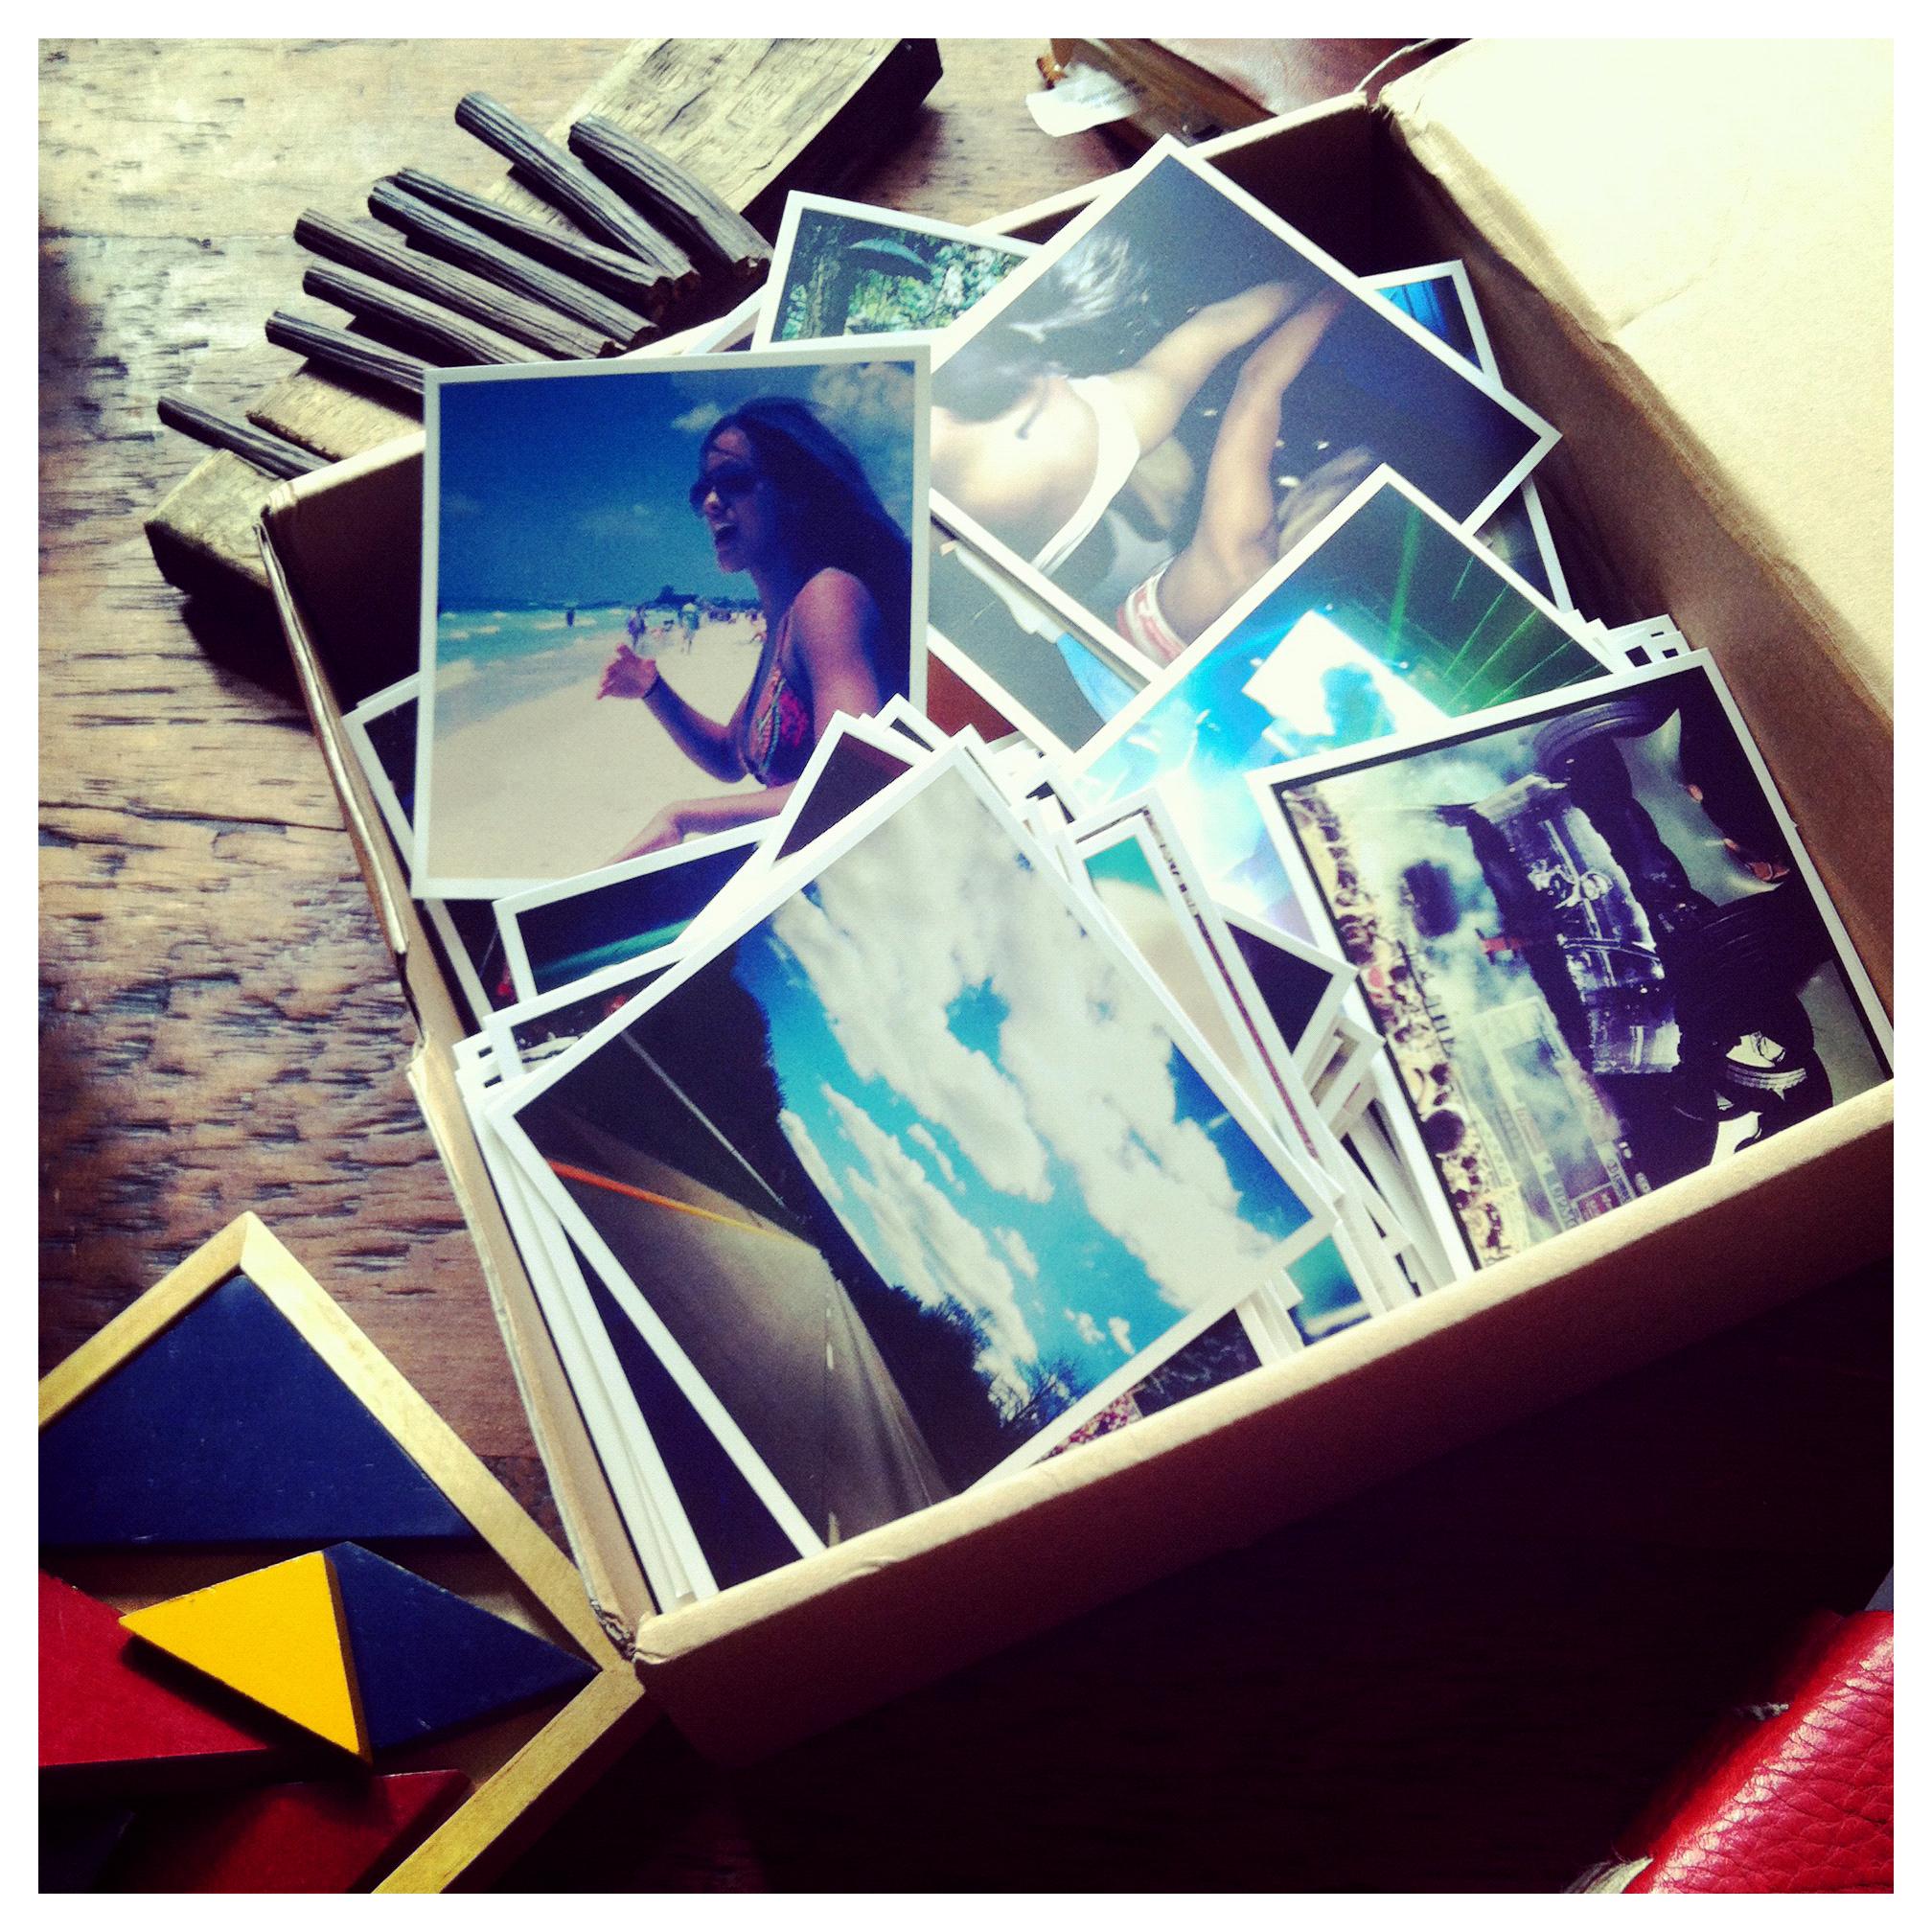 LIFE in a cardboard box.